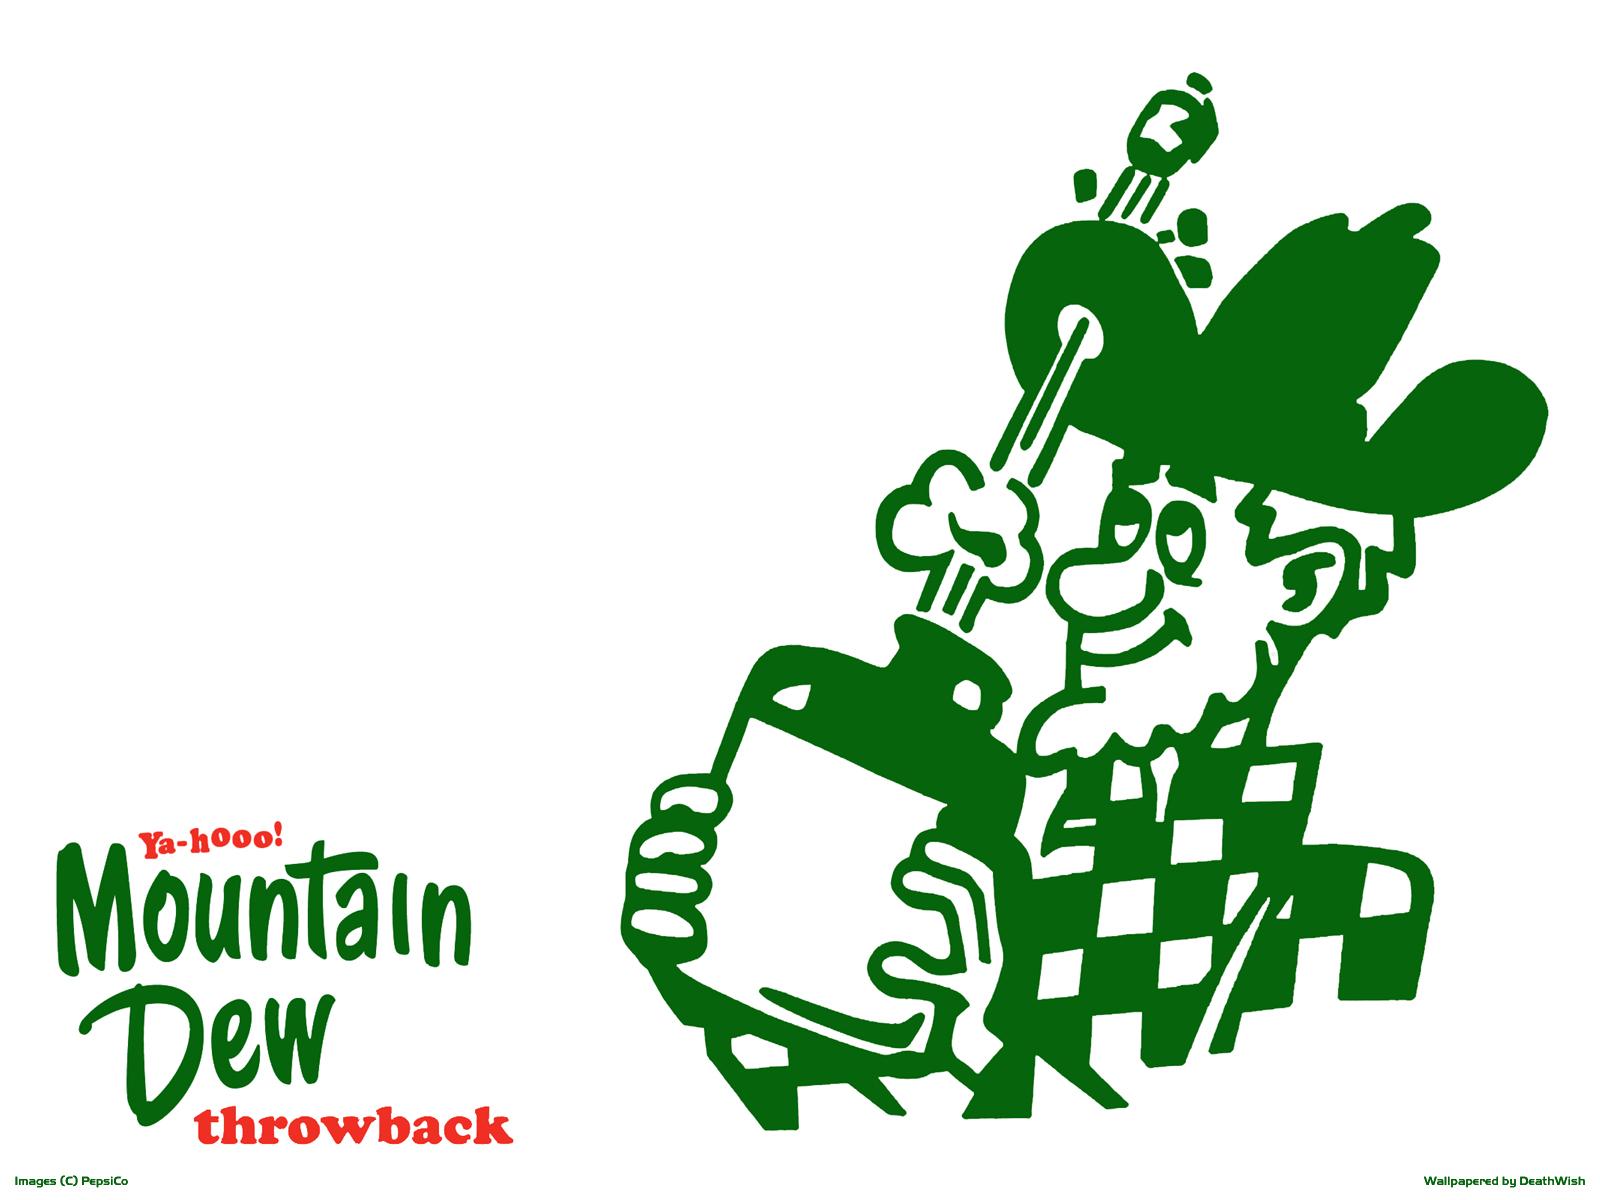 Old mountain dew Logos.